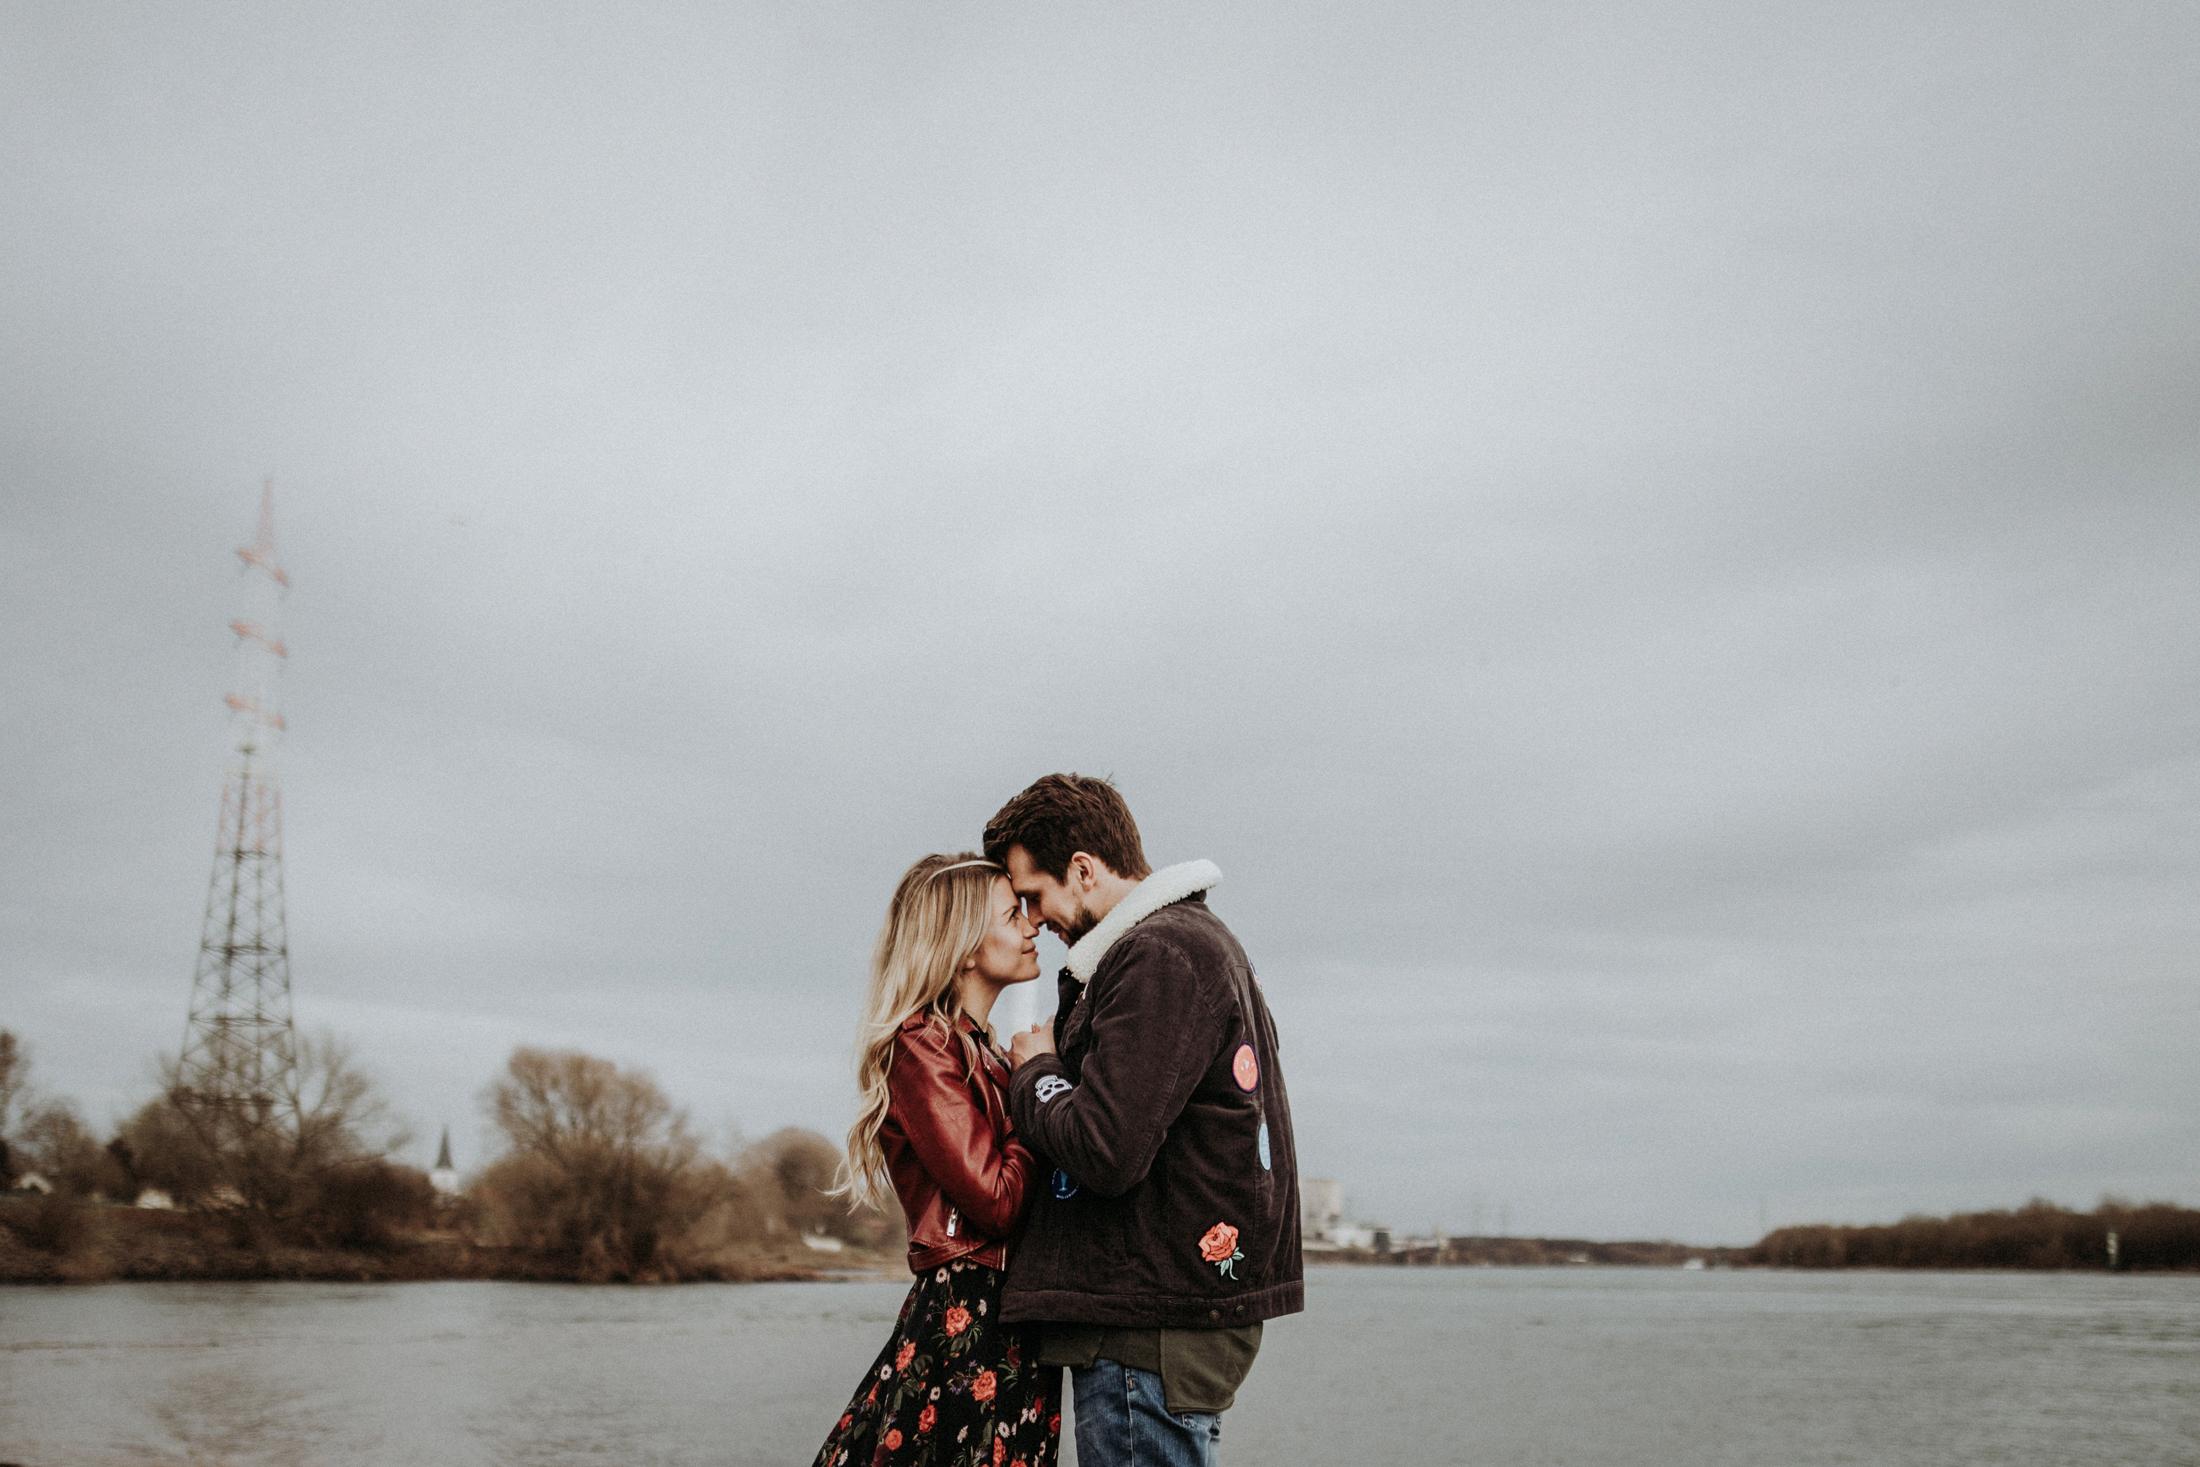 Wedding_Photographer_Mallorca_DanielaMarquardt_Photography_CanaryIslands_Lanzarote_Iceland_Tuscany_Santorini_Portugal_NewYork_Spain_Elopement_Hochzeitsfotograf_CK72